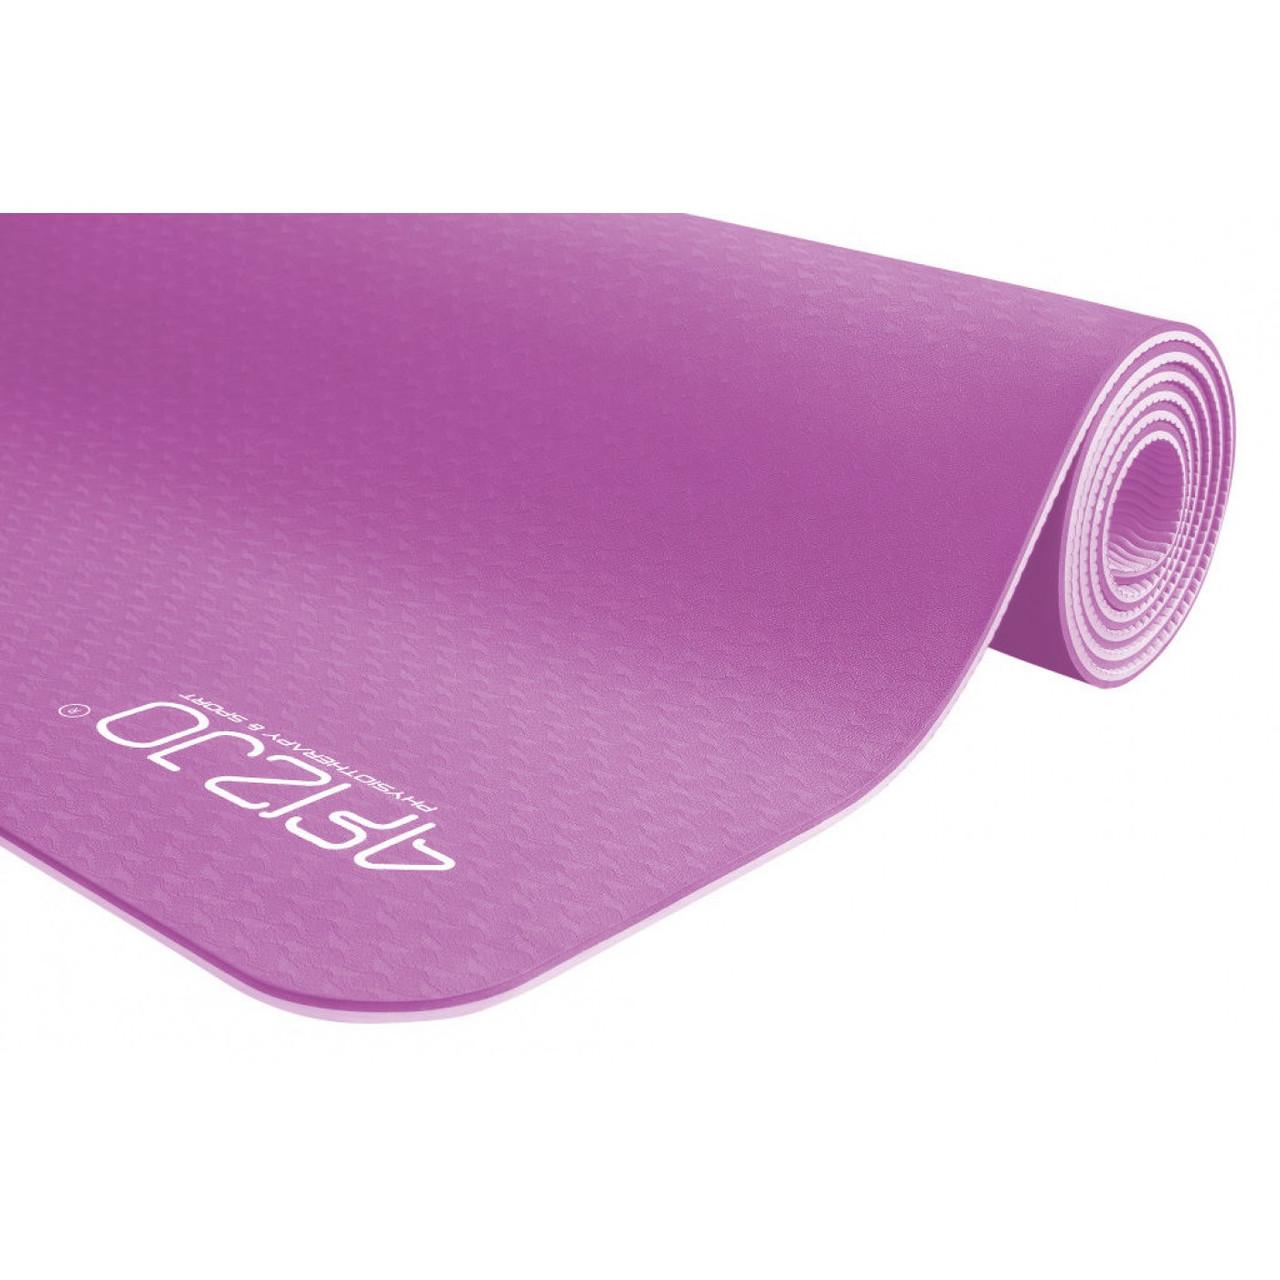 Коврик (мат) для йоги и фитнеса 4FIZJO TPE 6 мм 4FJ0143 Pink/Purple